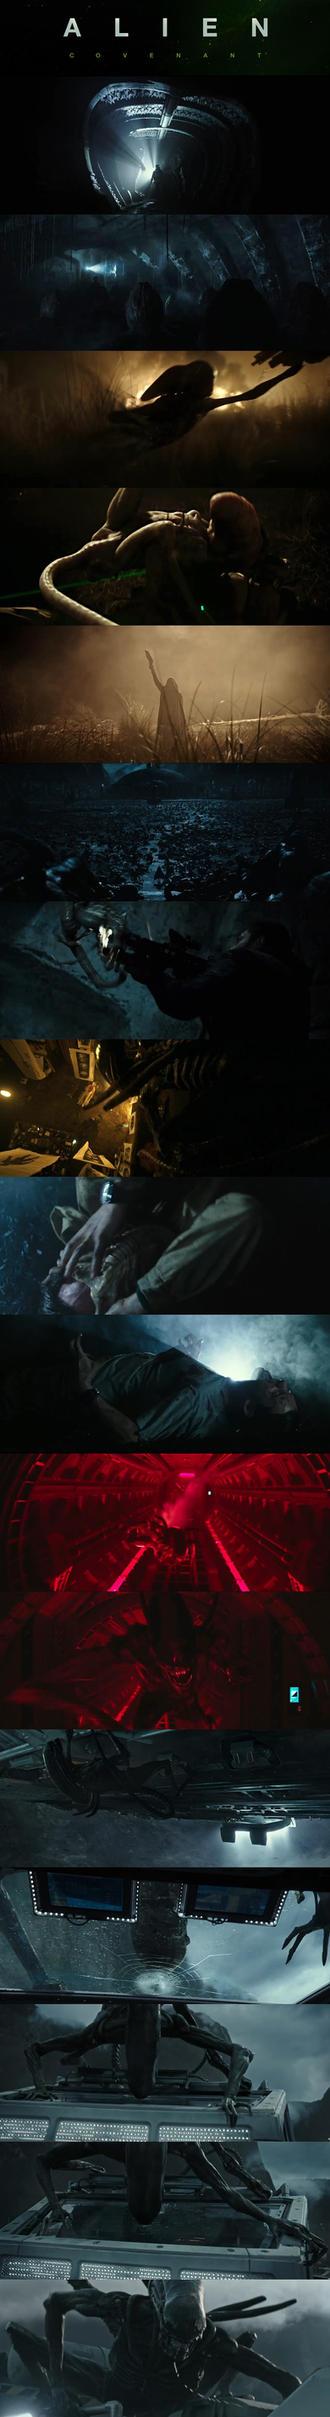 Alien Covenant trailer 2 screens by lordLKkamikaze